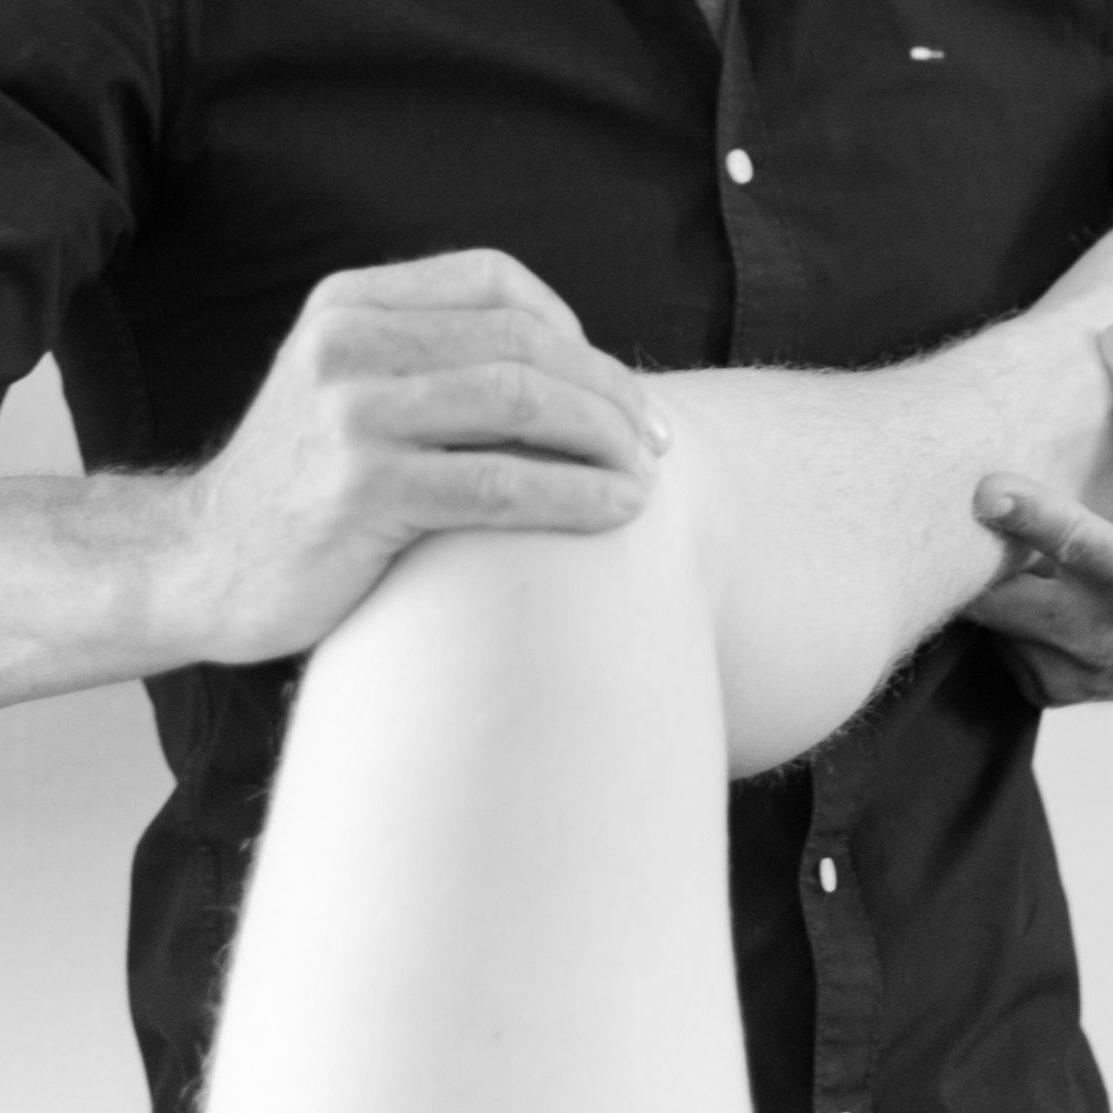 Fysiotherapie, Fysiotherapeut, Fysiotherapiepraktijk, Fysio, Beek, Kuijs Fysiotherapie, Fysiofitcare, Knieklachten, Kniepijn